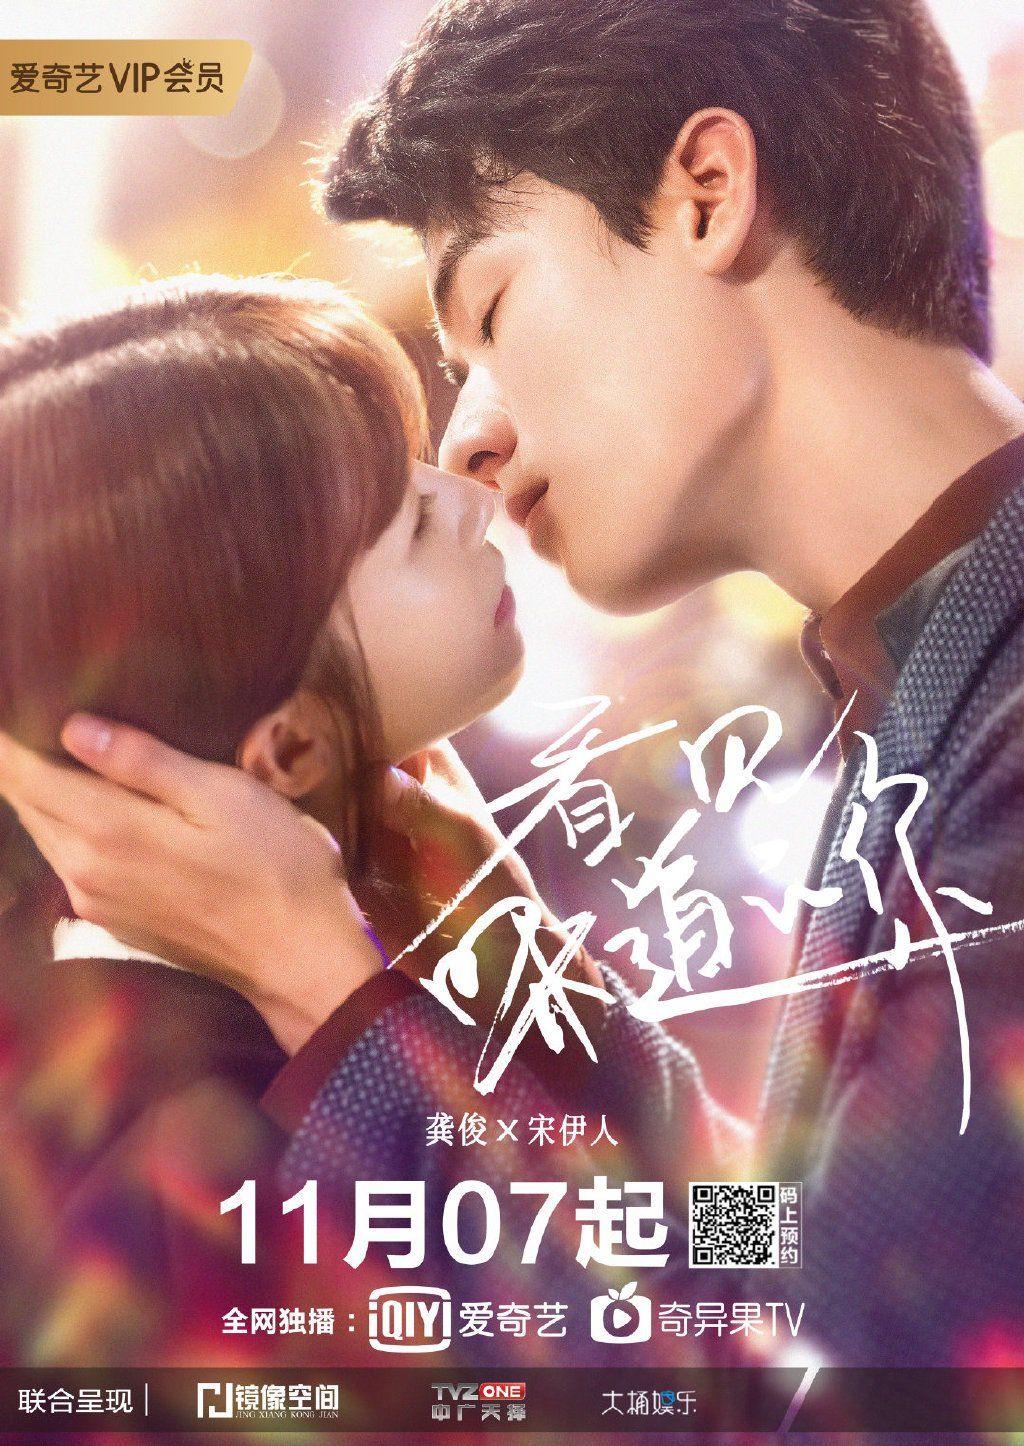 Chinesedrama Info On Twitter Japanese Drama Chines Drama Korean Drama List